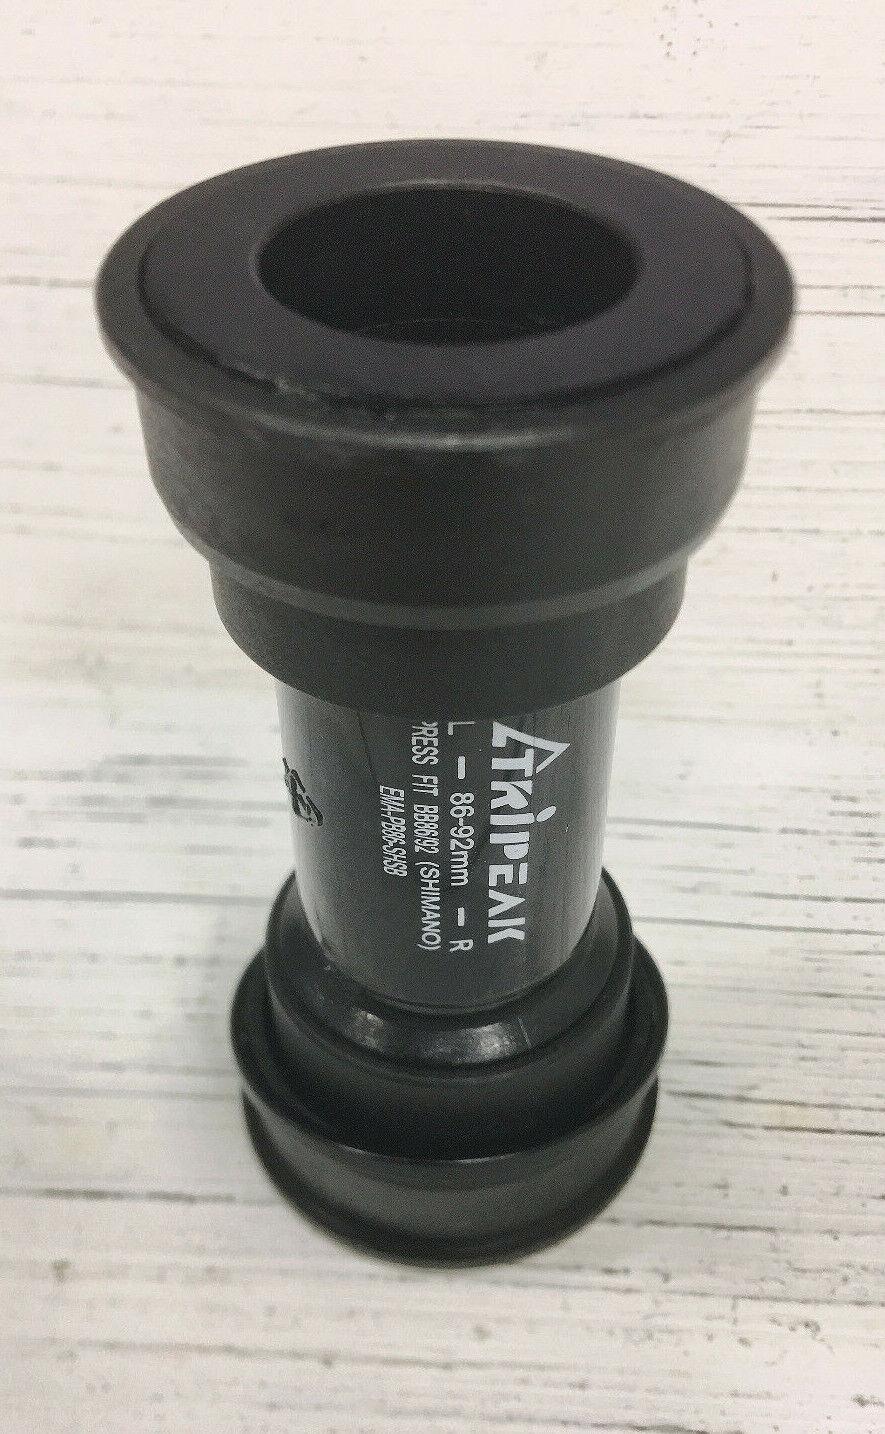 2x6806 Bearing inside BB-BS30 Tripeak Bottom Brackets BB30 For UBB30 Black 68mm